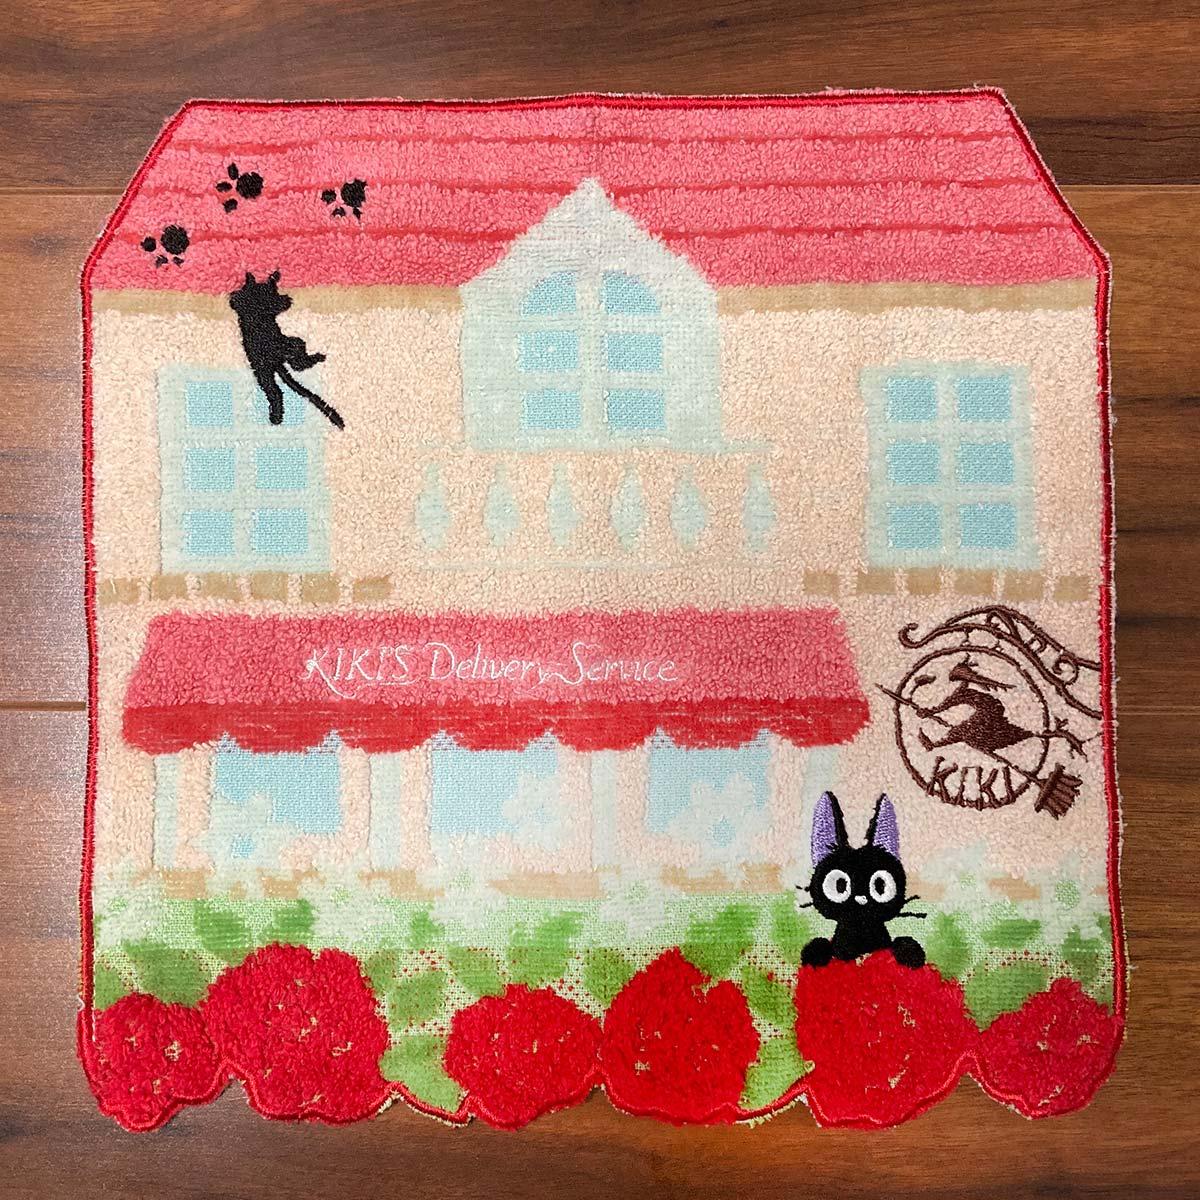 "Marushin Jiji Flower Maison Mini Towel ""Kiki's Delivery Service"""